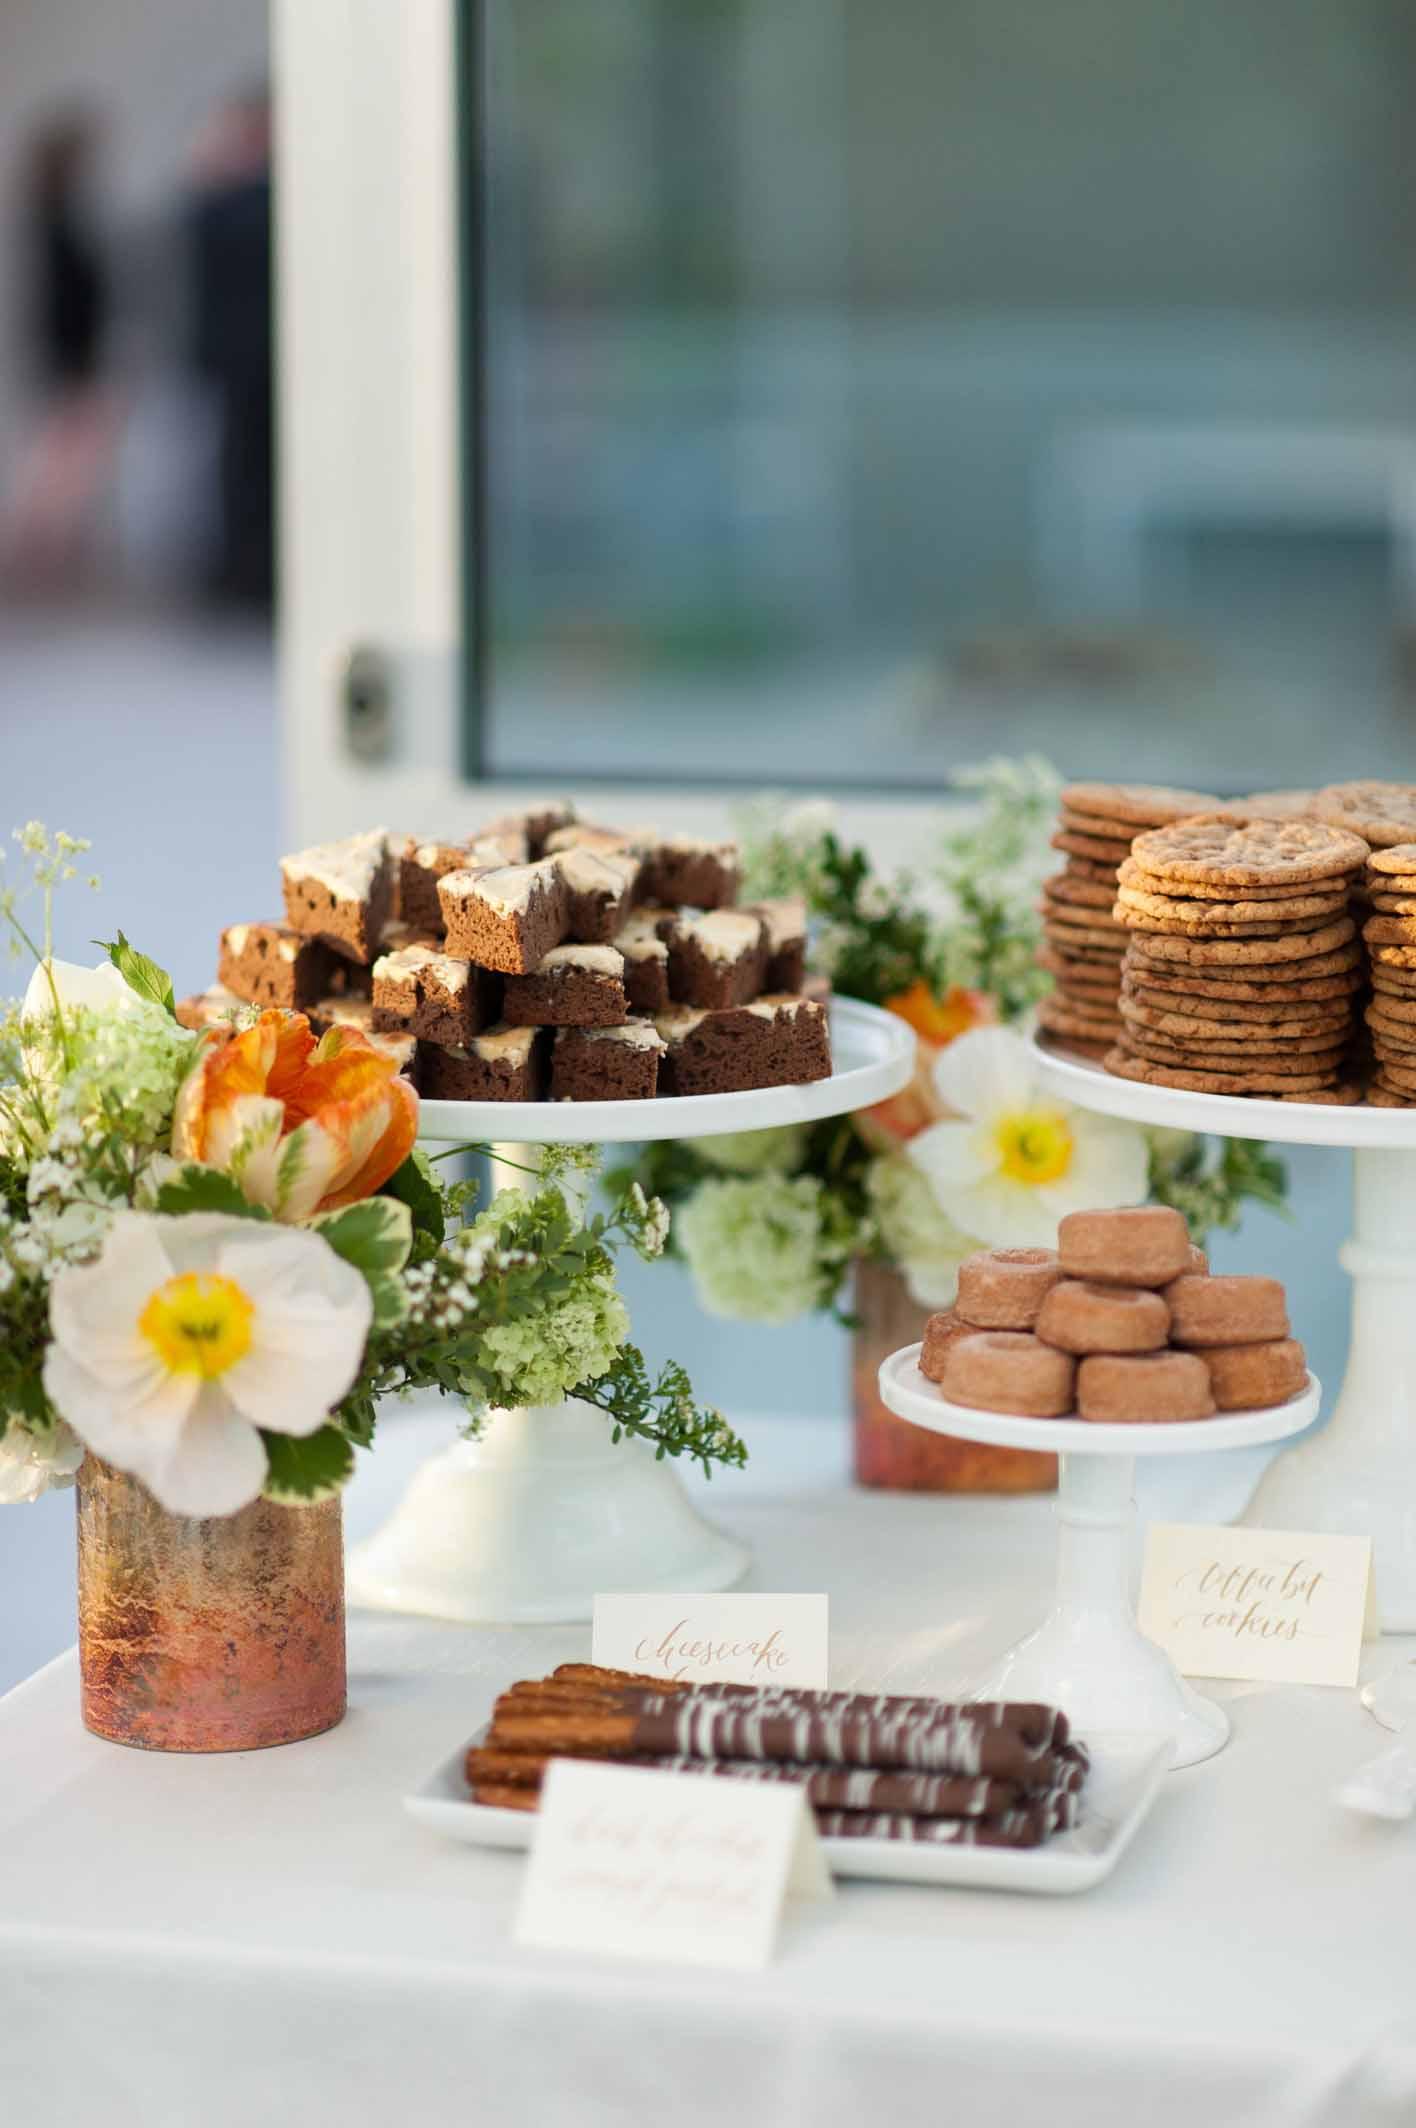 Floral decor on dessert table at spring wedding